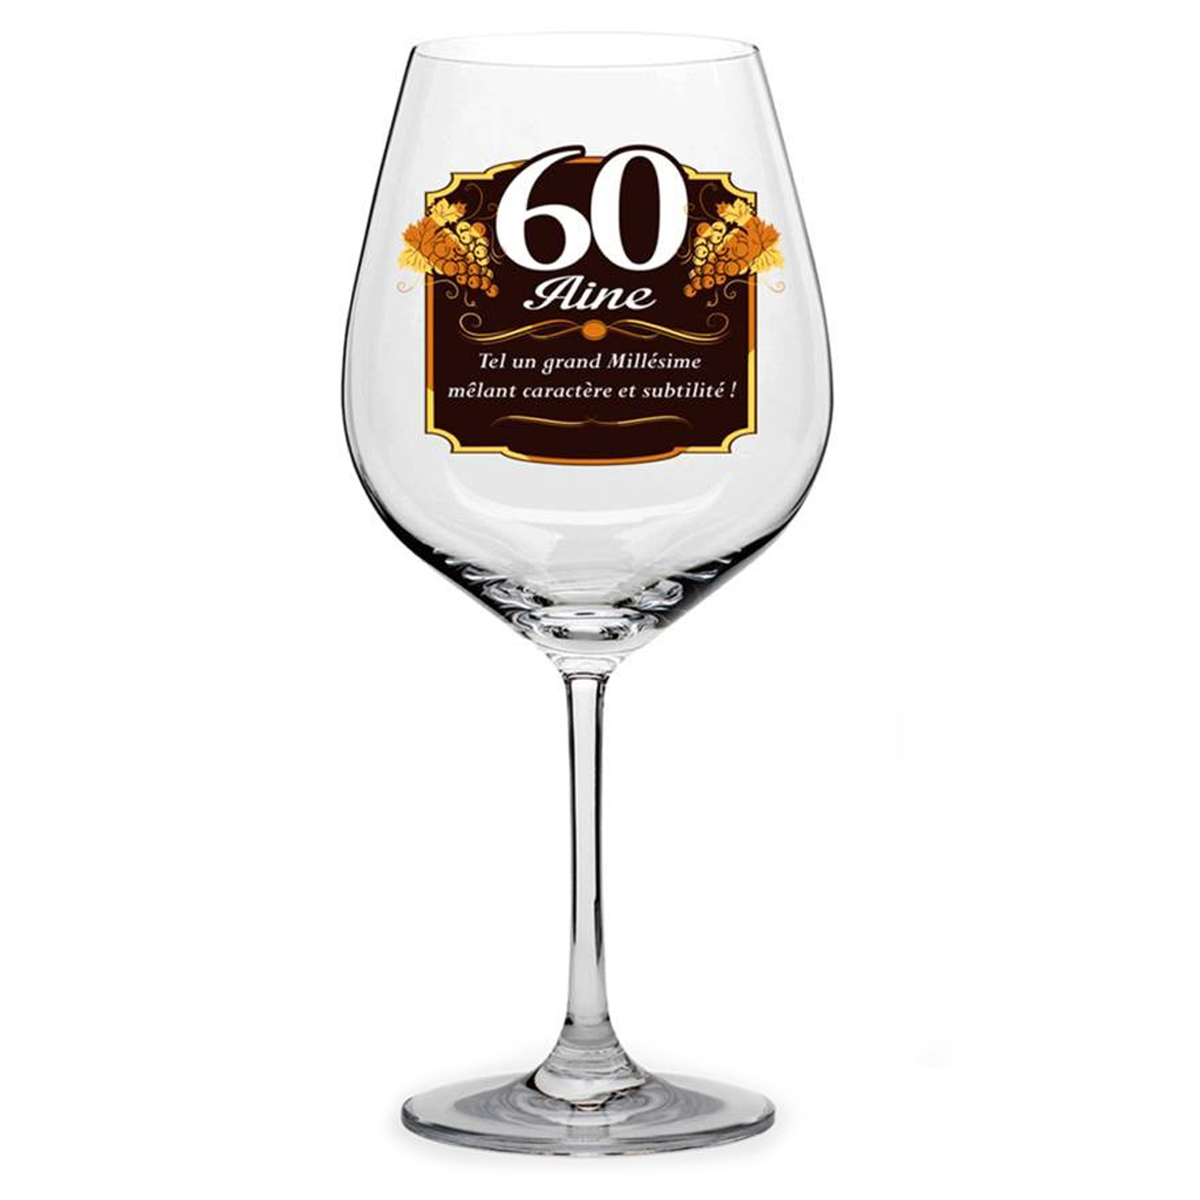 Verre à vin \'60 aine\'  - [N6149]